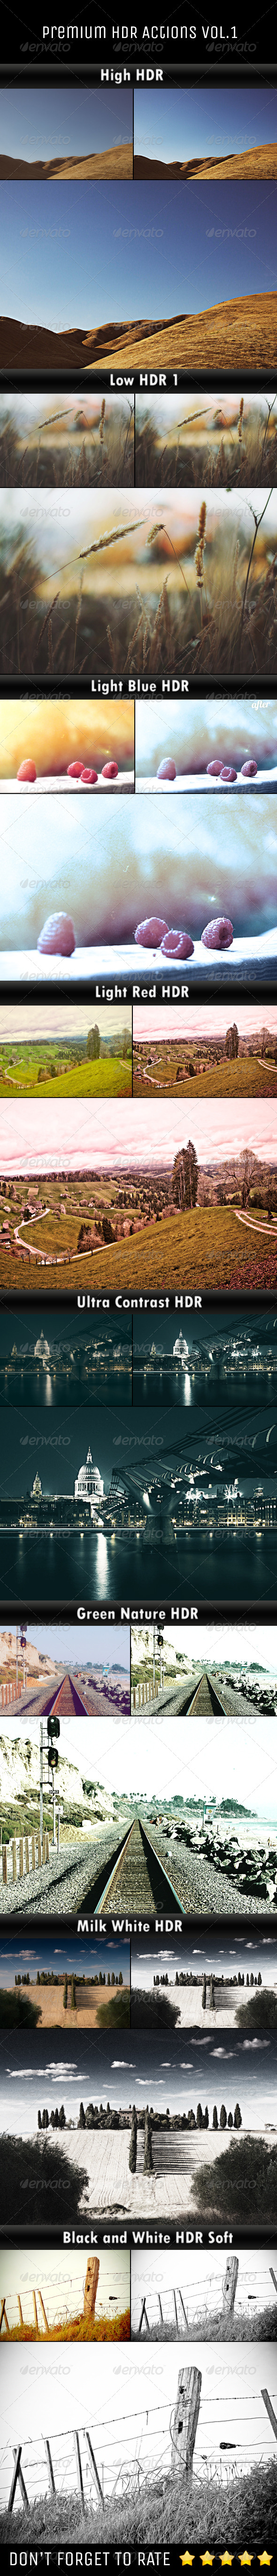 GraphicRiver Premium HDR Actions Vol.1 6071477